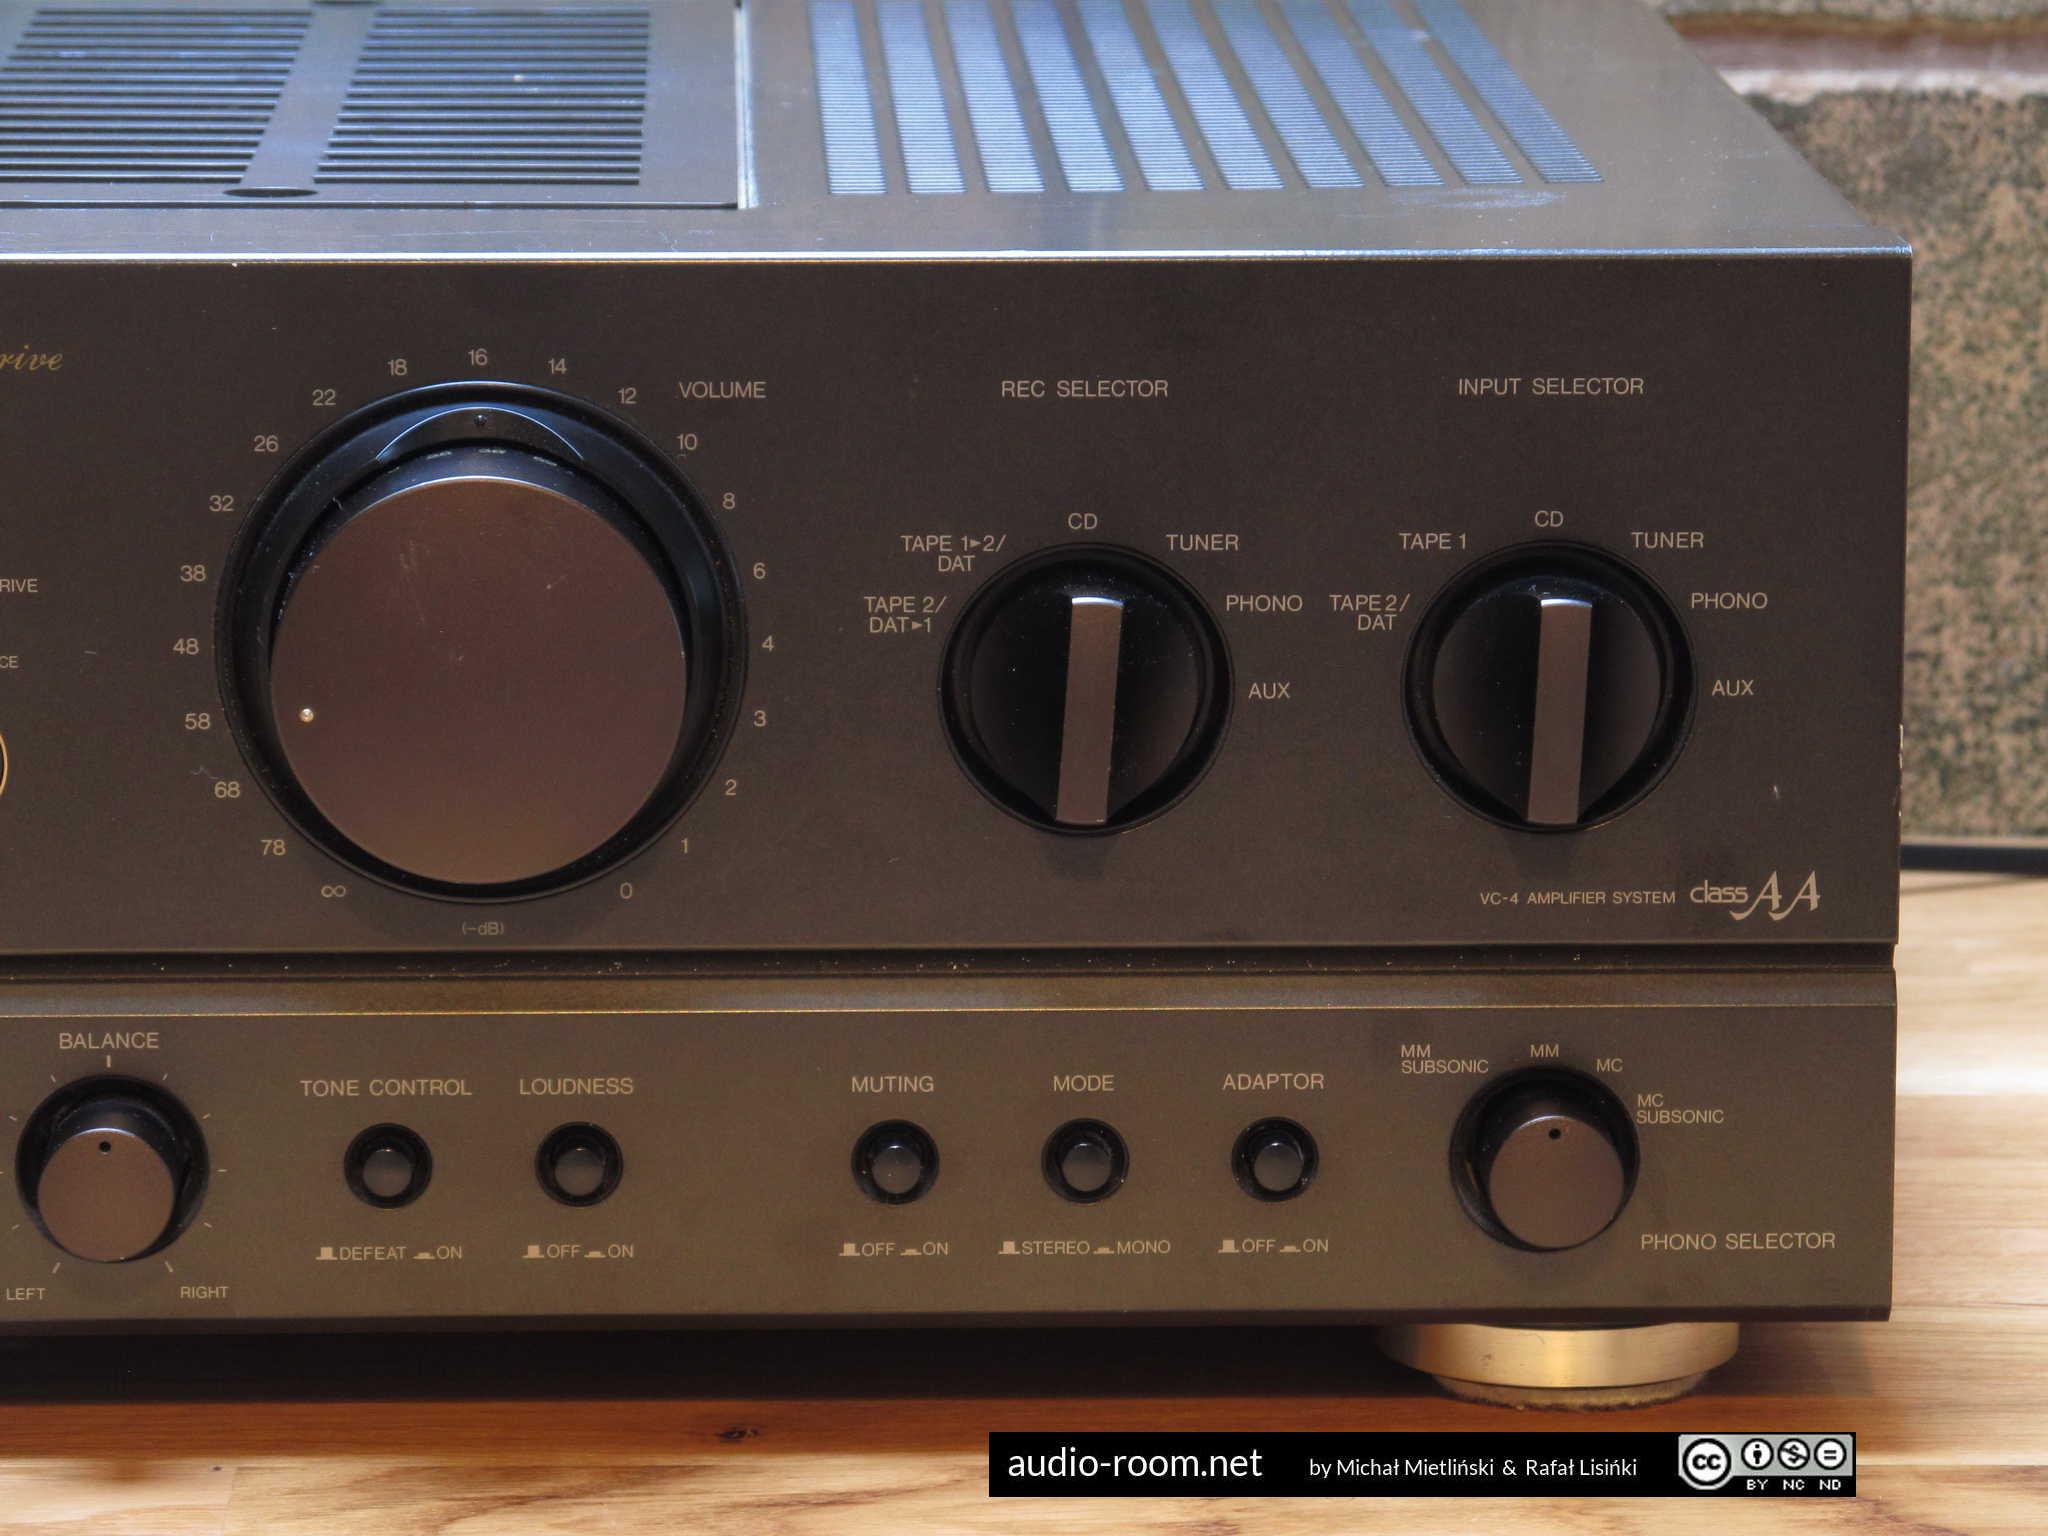 technics_su-vx800_bimg_0034a